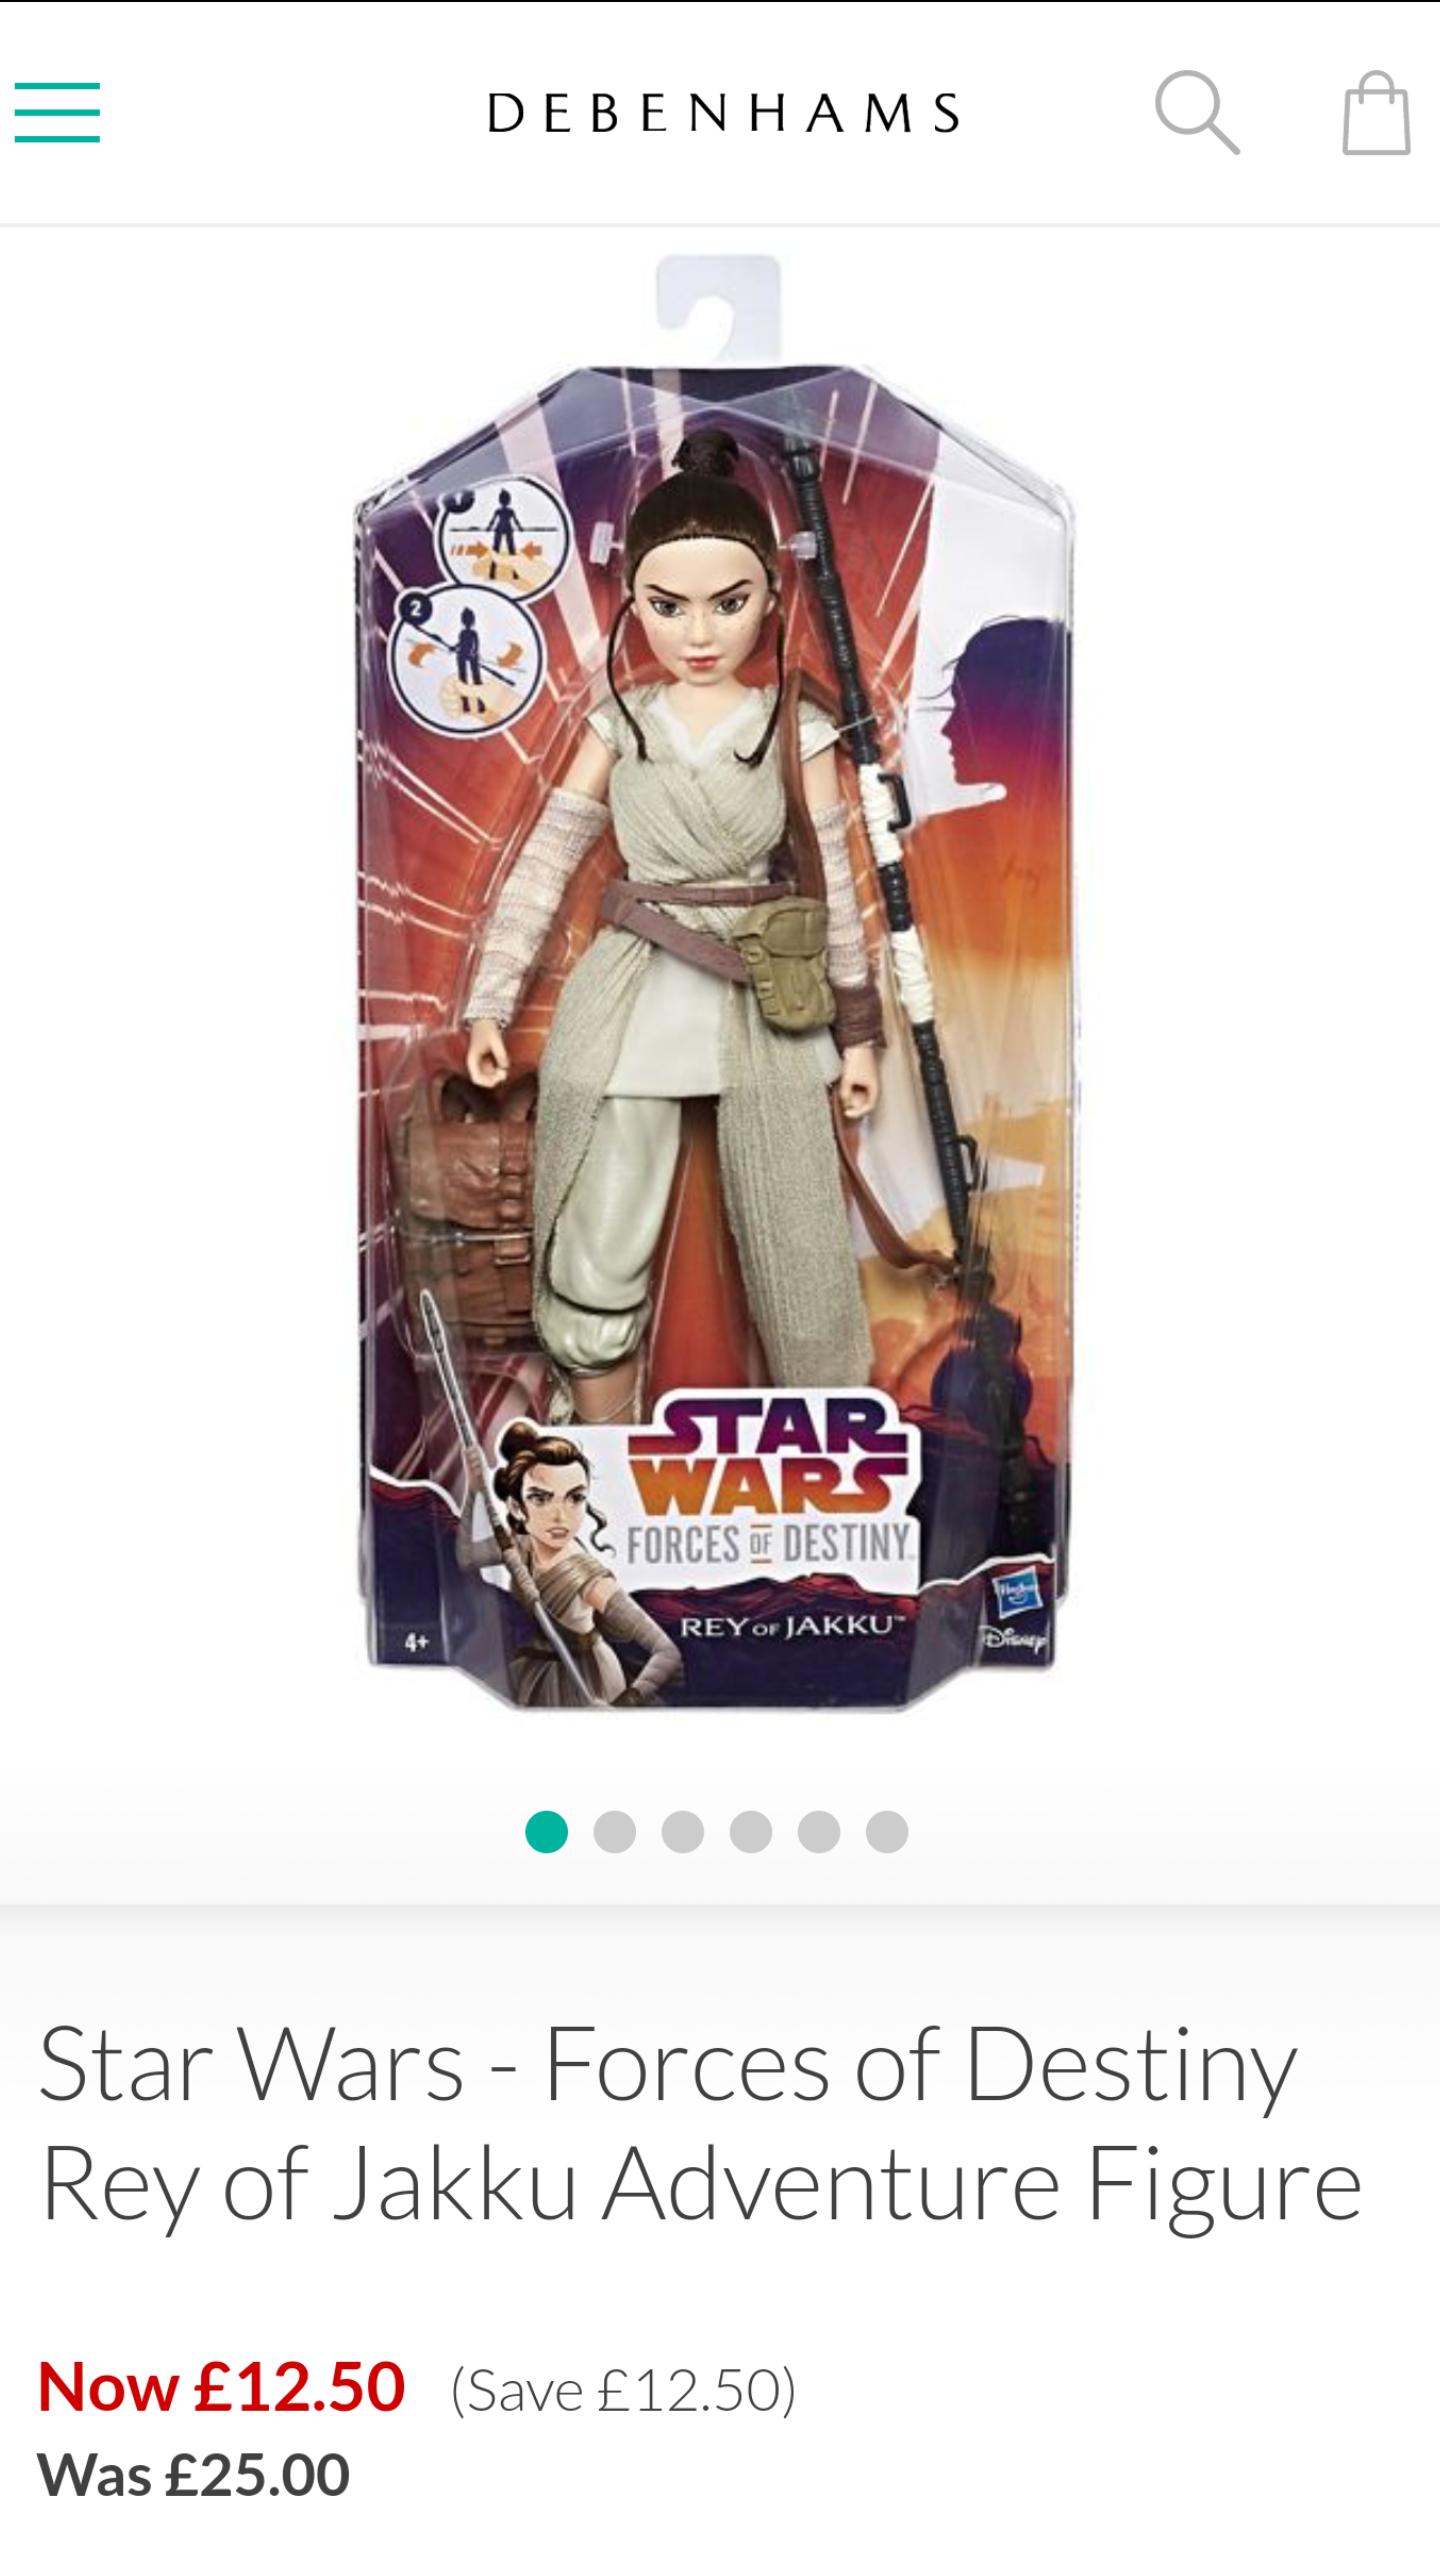 Star Wars-Forces of Destiny Rey of Jakku Adventure Figure - Debenhams - £12.50